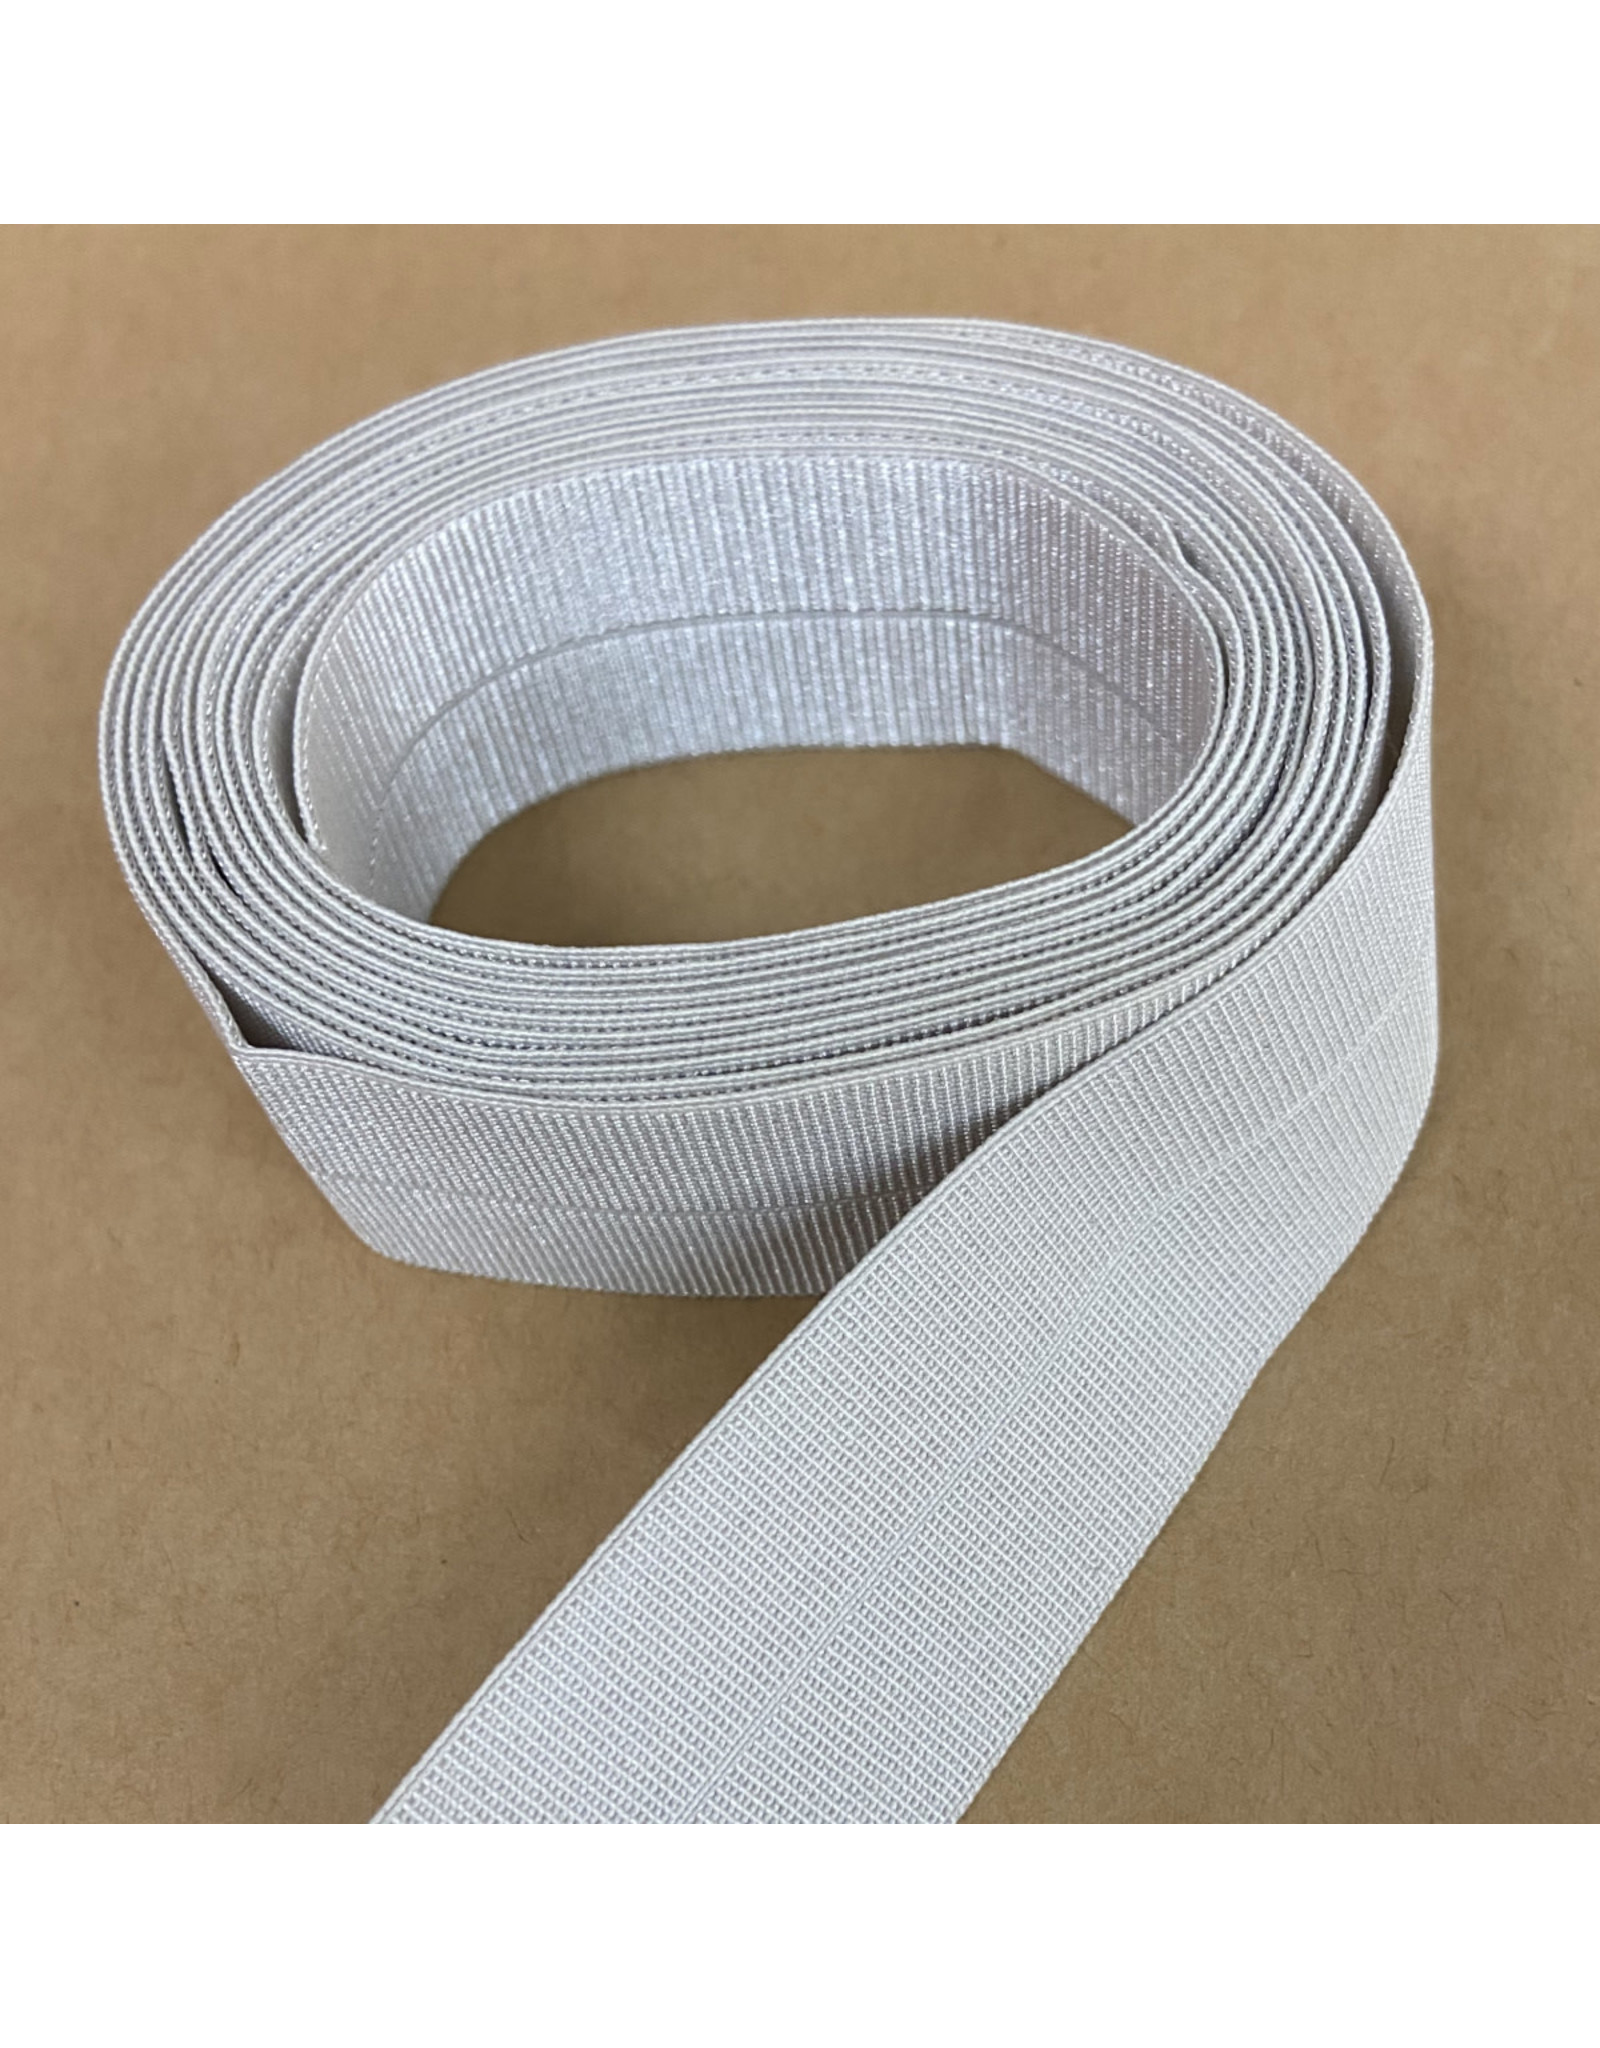 Picking Daisies Fold-Over Elastic Ribbon, 2-Yard Cut, Silt